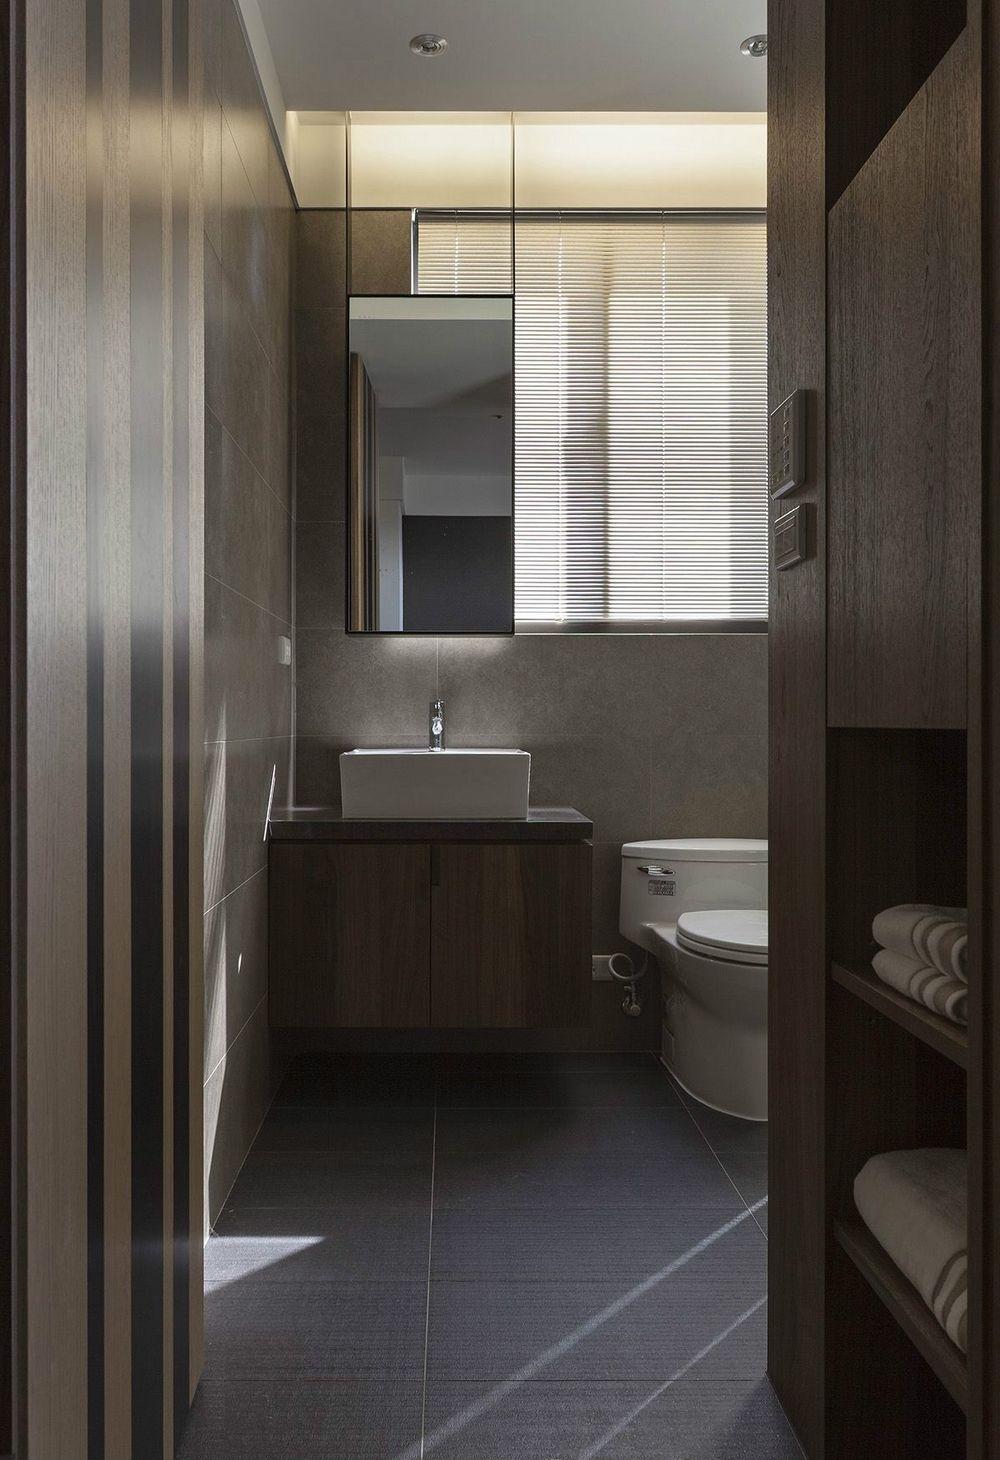 comforter sets interior design salary and interiors rh pinterest com hong kong interior designer salary